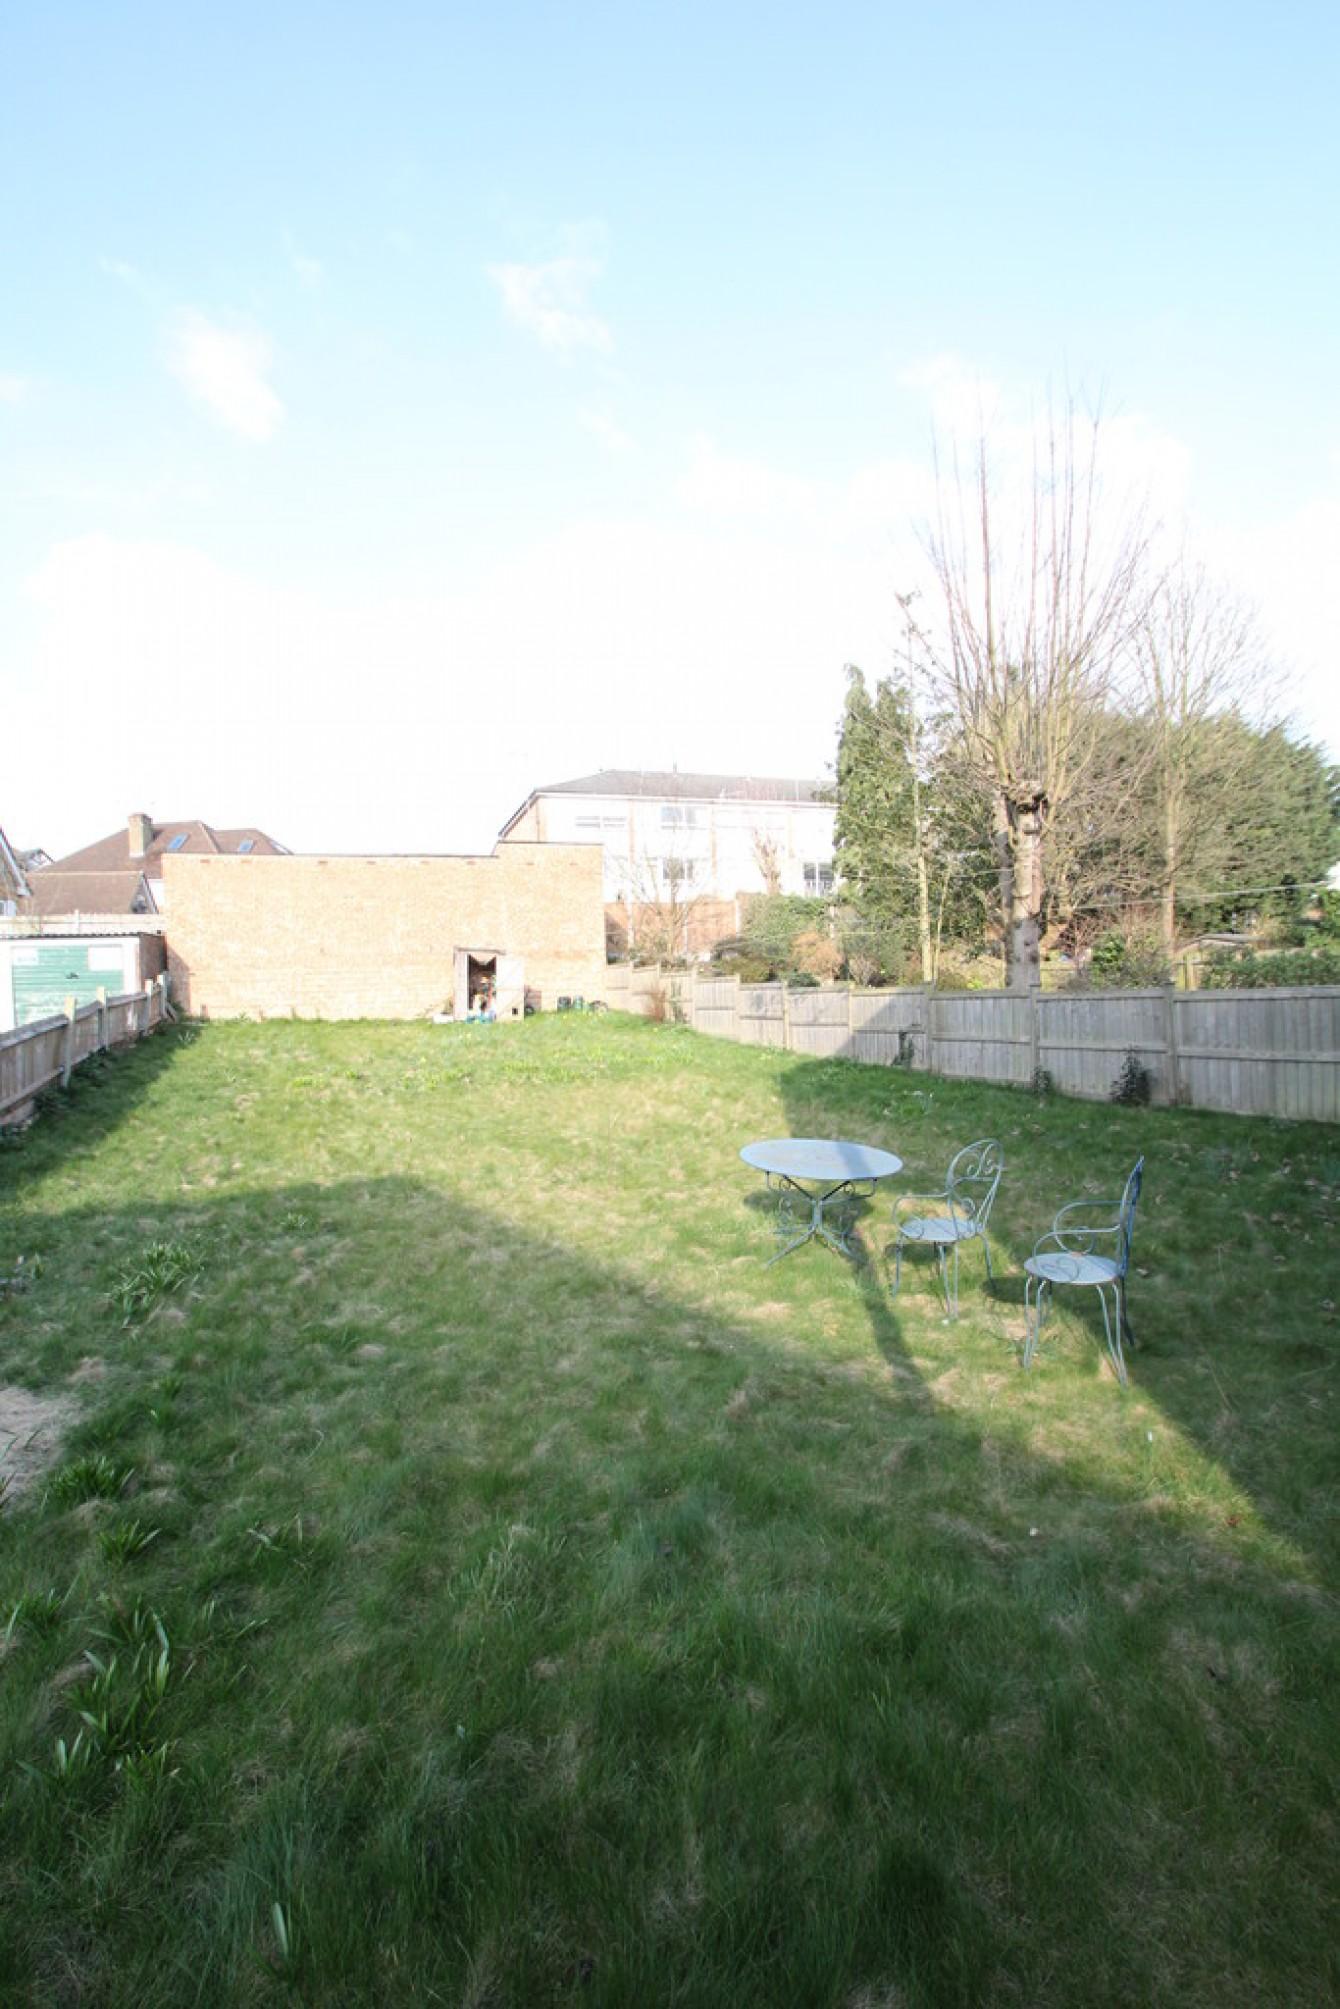 Images for West Finchley, London EAID:c8d5f0ae42d594d169bca90f3b8b041a BID:1